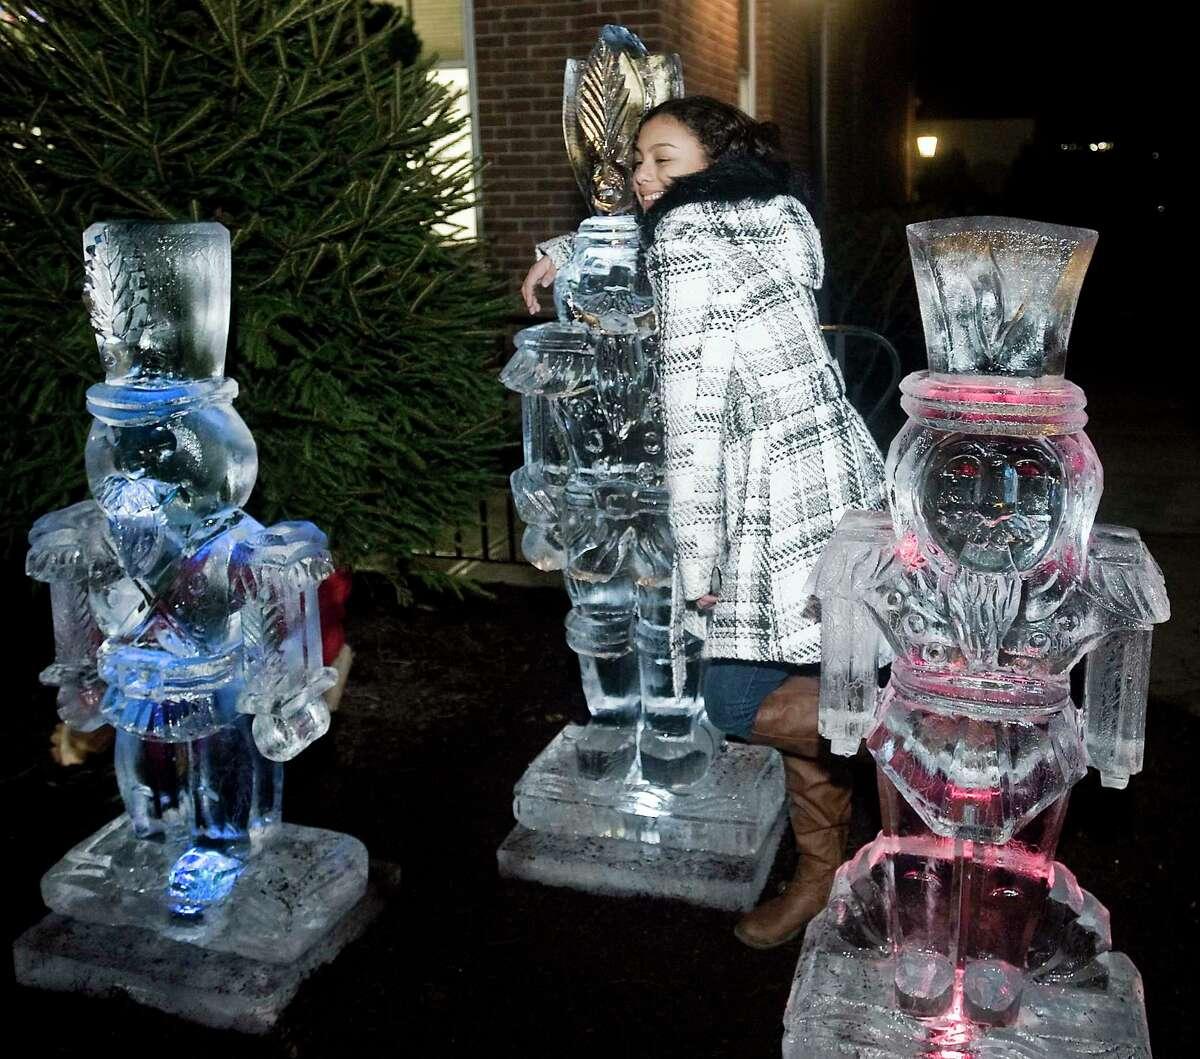 Tatiana Carmona gives an ice sculpture a hug at the Town Hall.